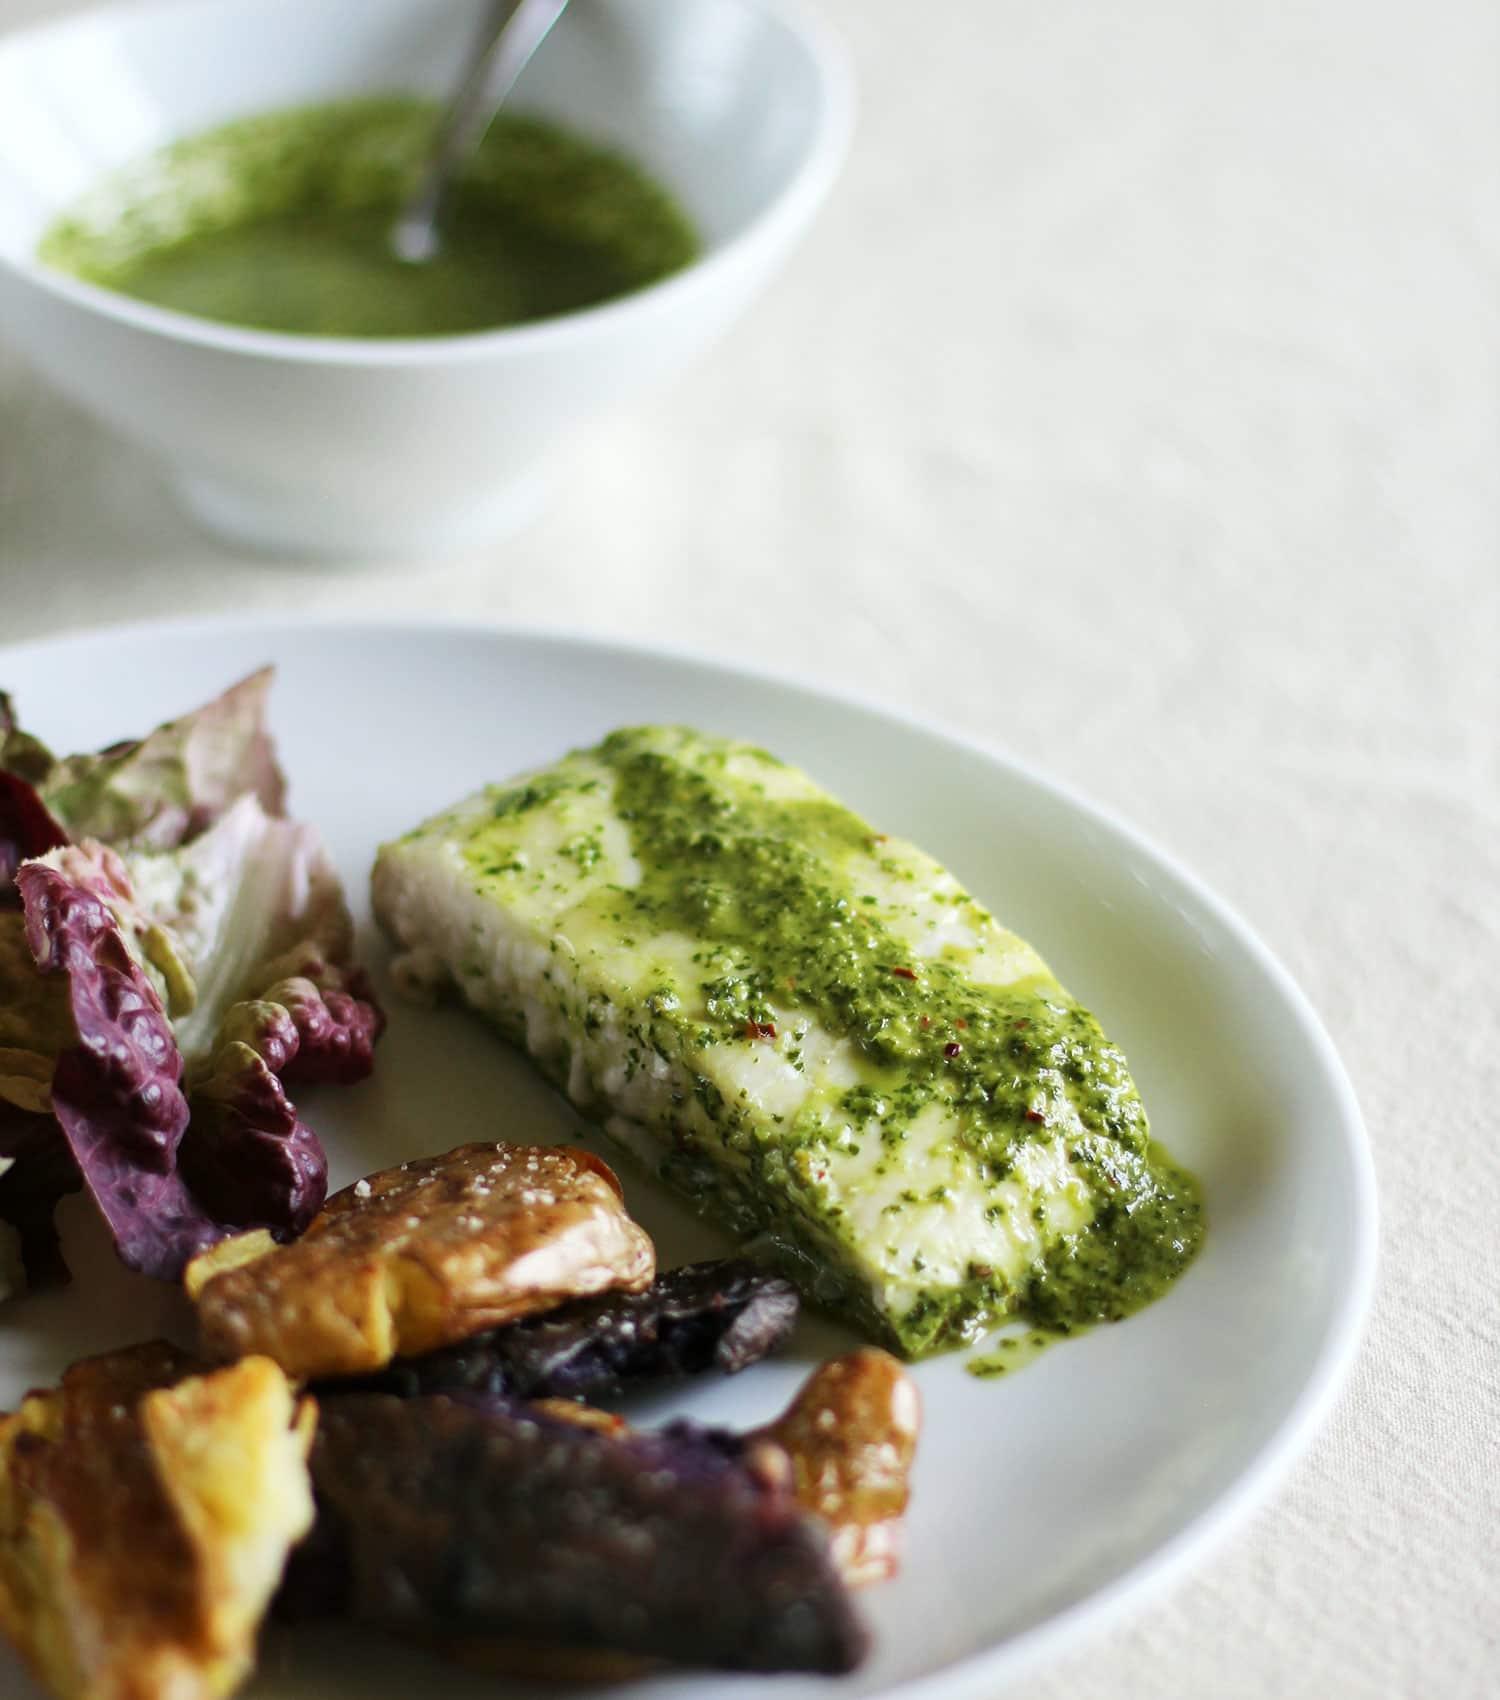 Recipe: Baked Chimichurri Halibut